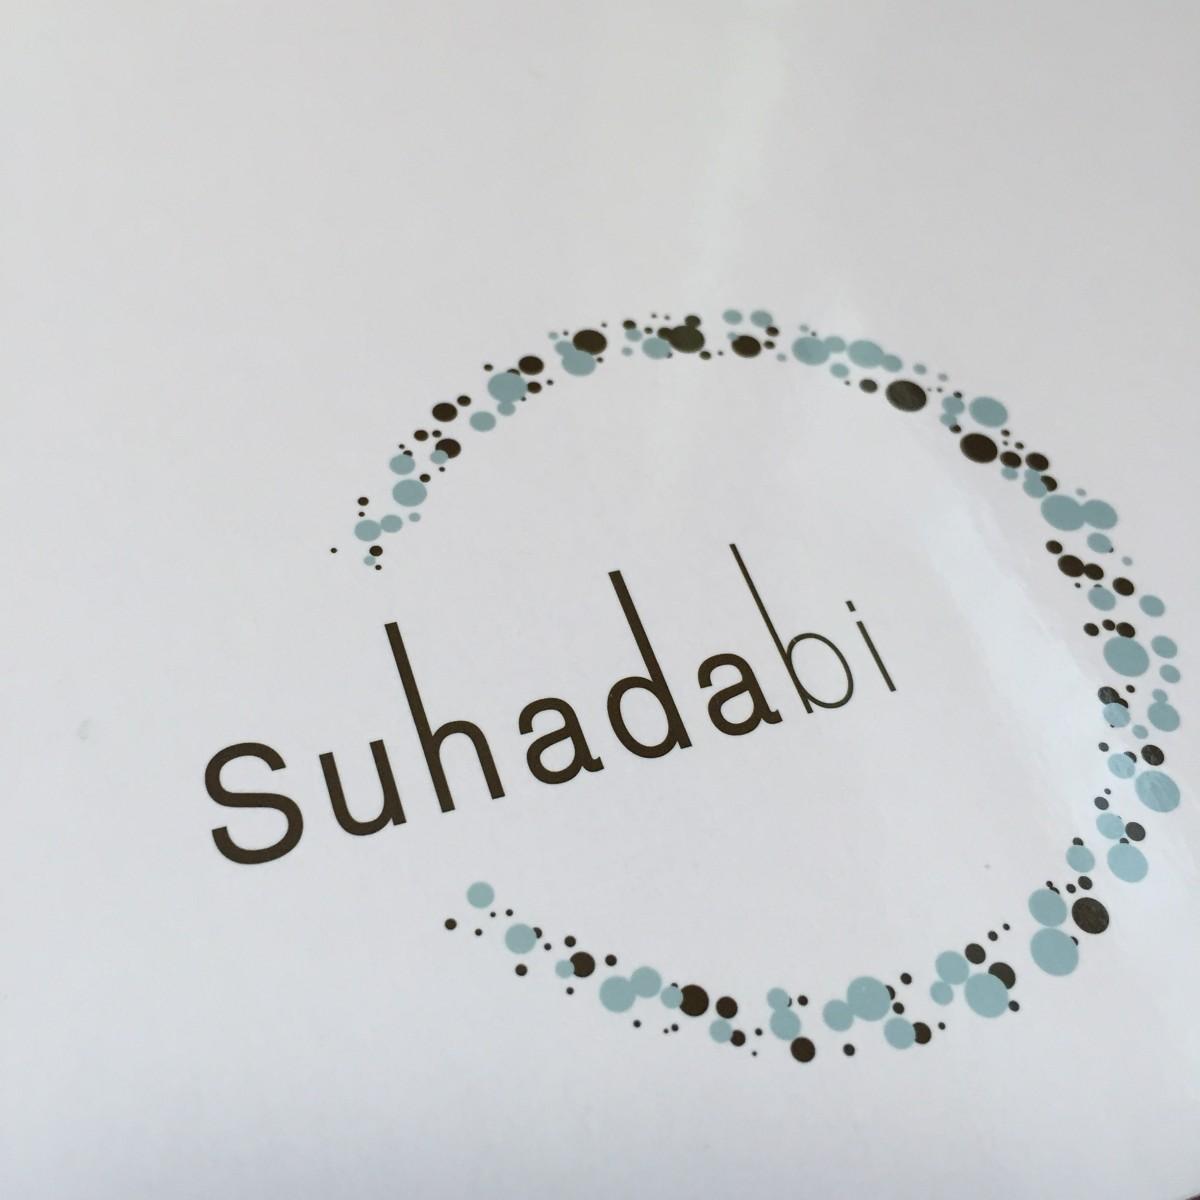 Suhadabi